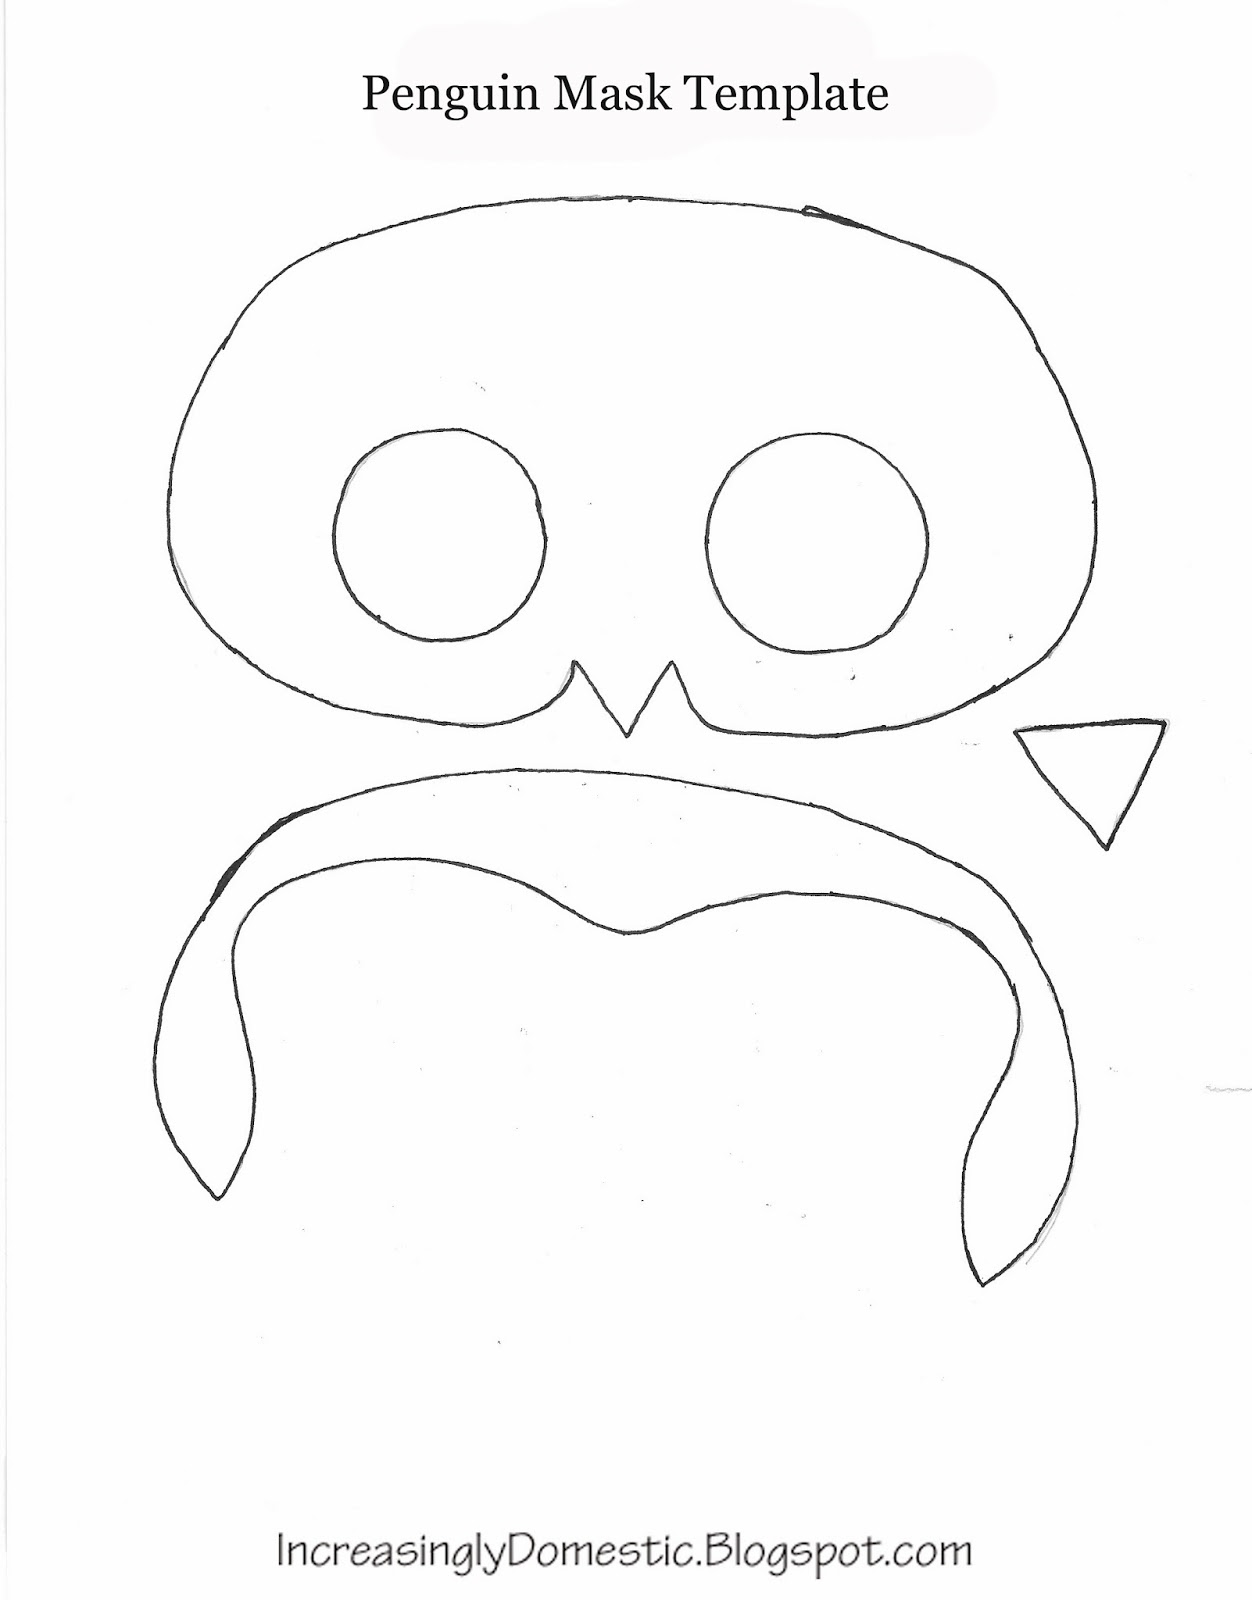 Increasingly Domestic   Tutorial  Penguin Mask